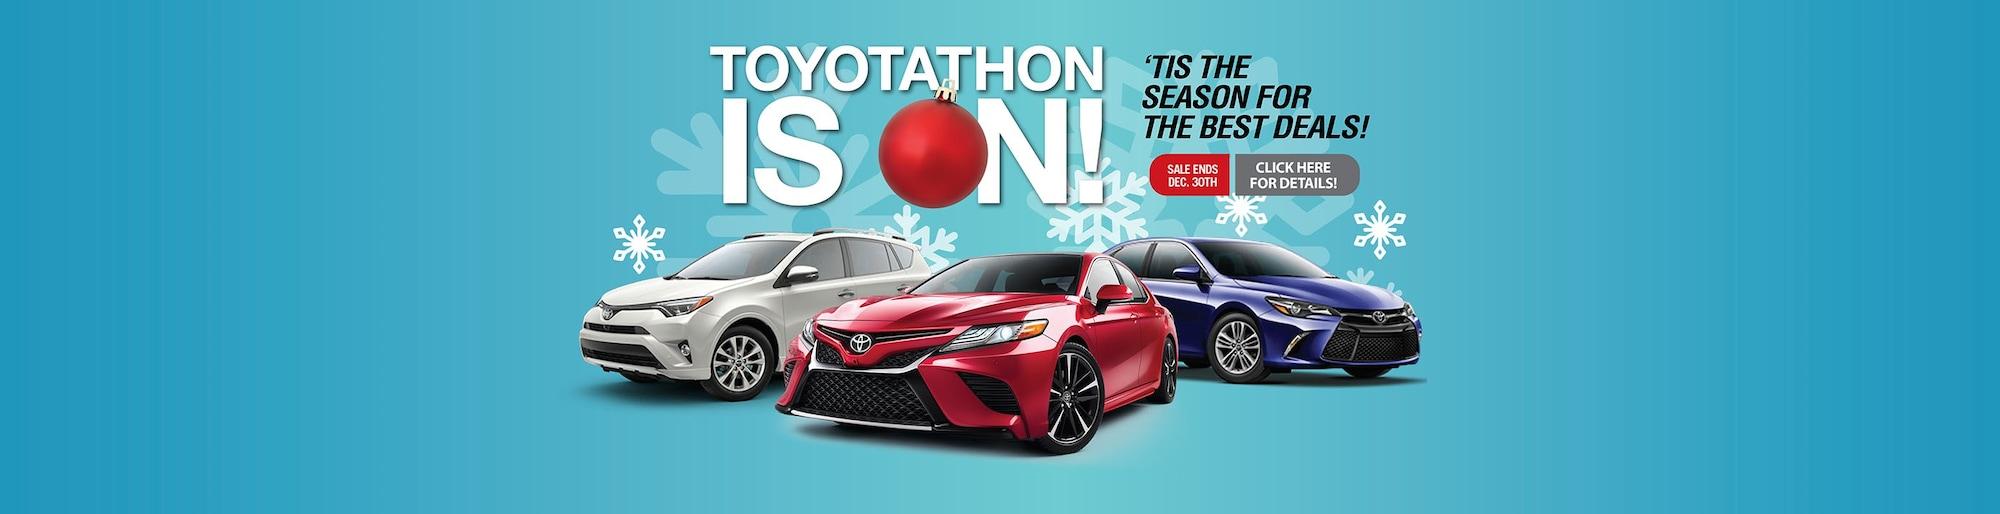 Toyota dealership kalamazoo mi serving mattawan portage for Mercedes benz dealership kalamazoo